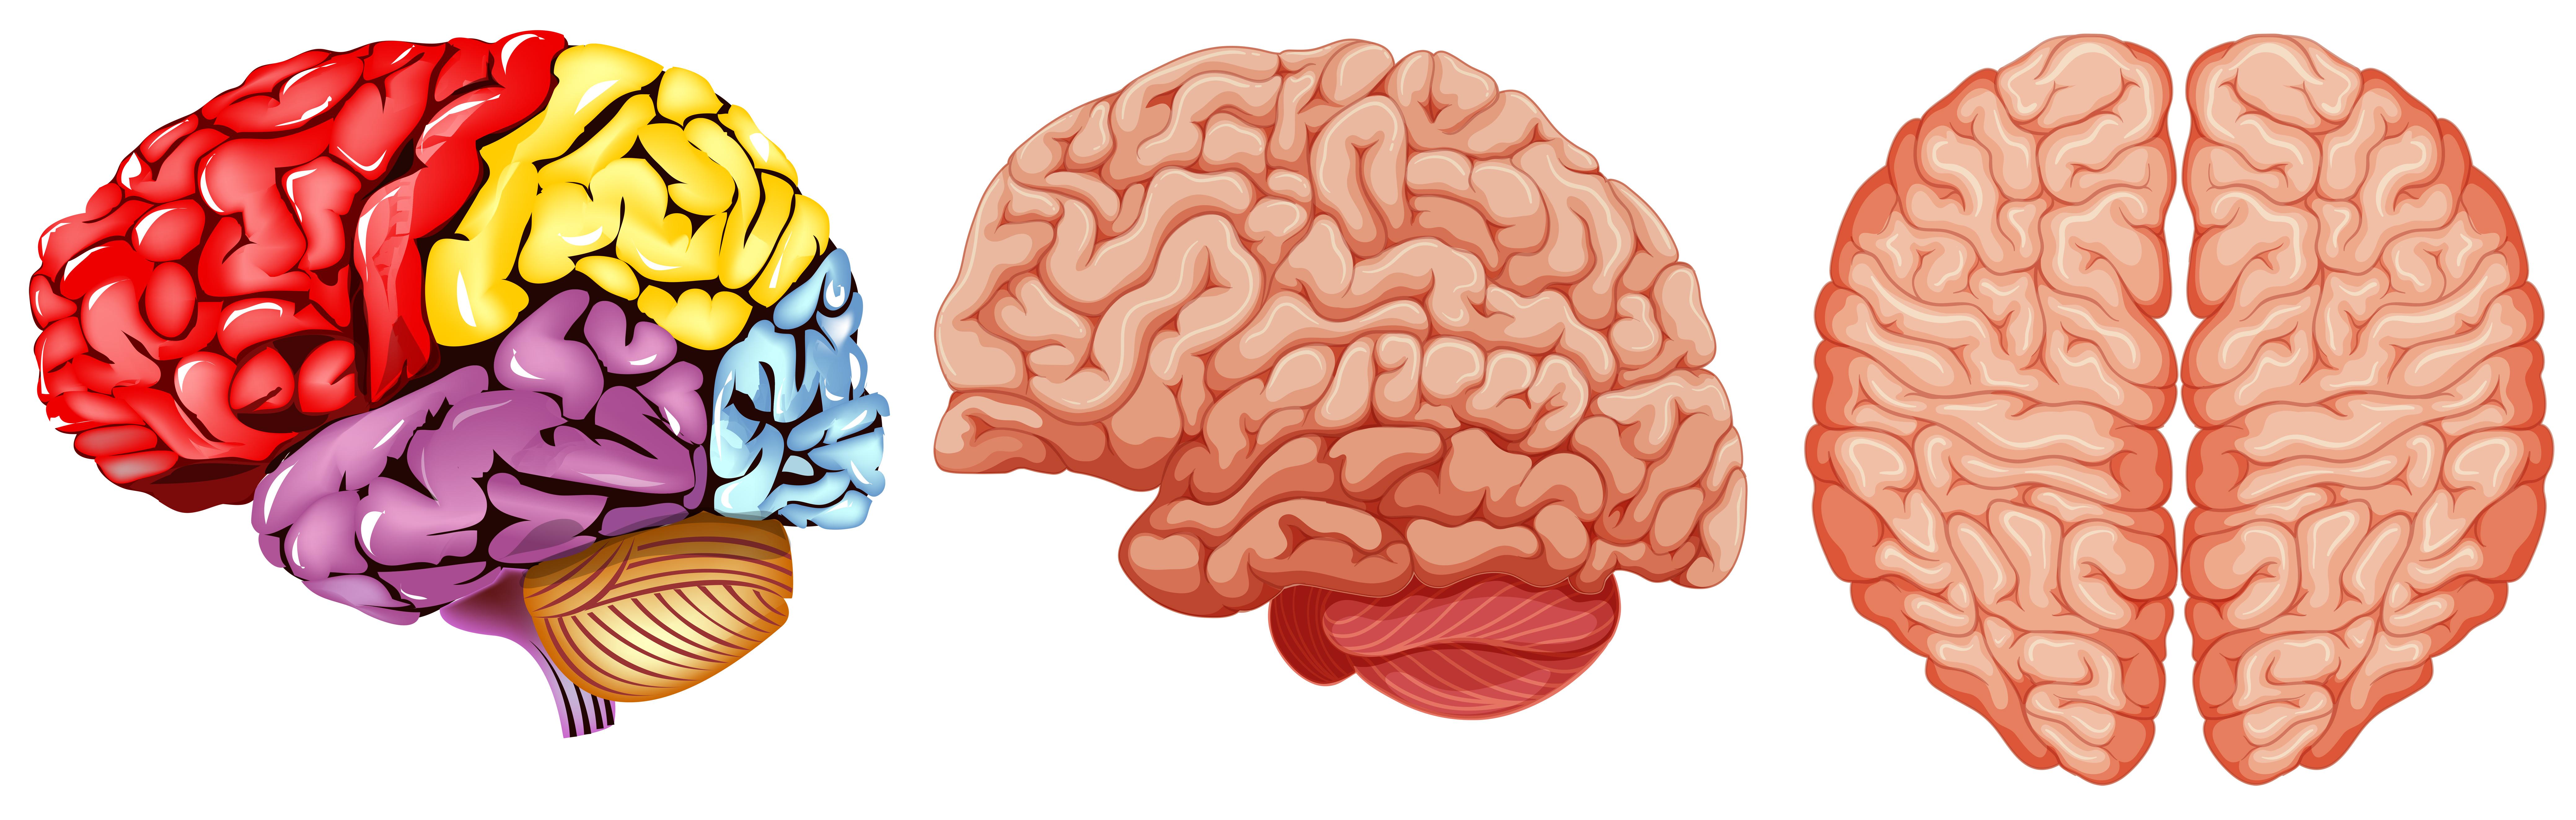 Different diagram of human brain - Download Free Vectors ...